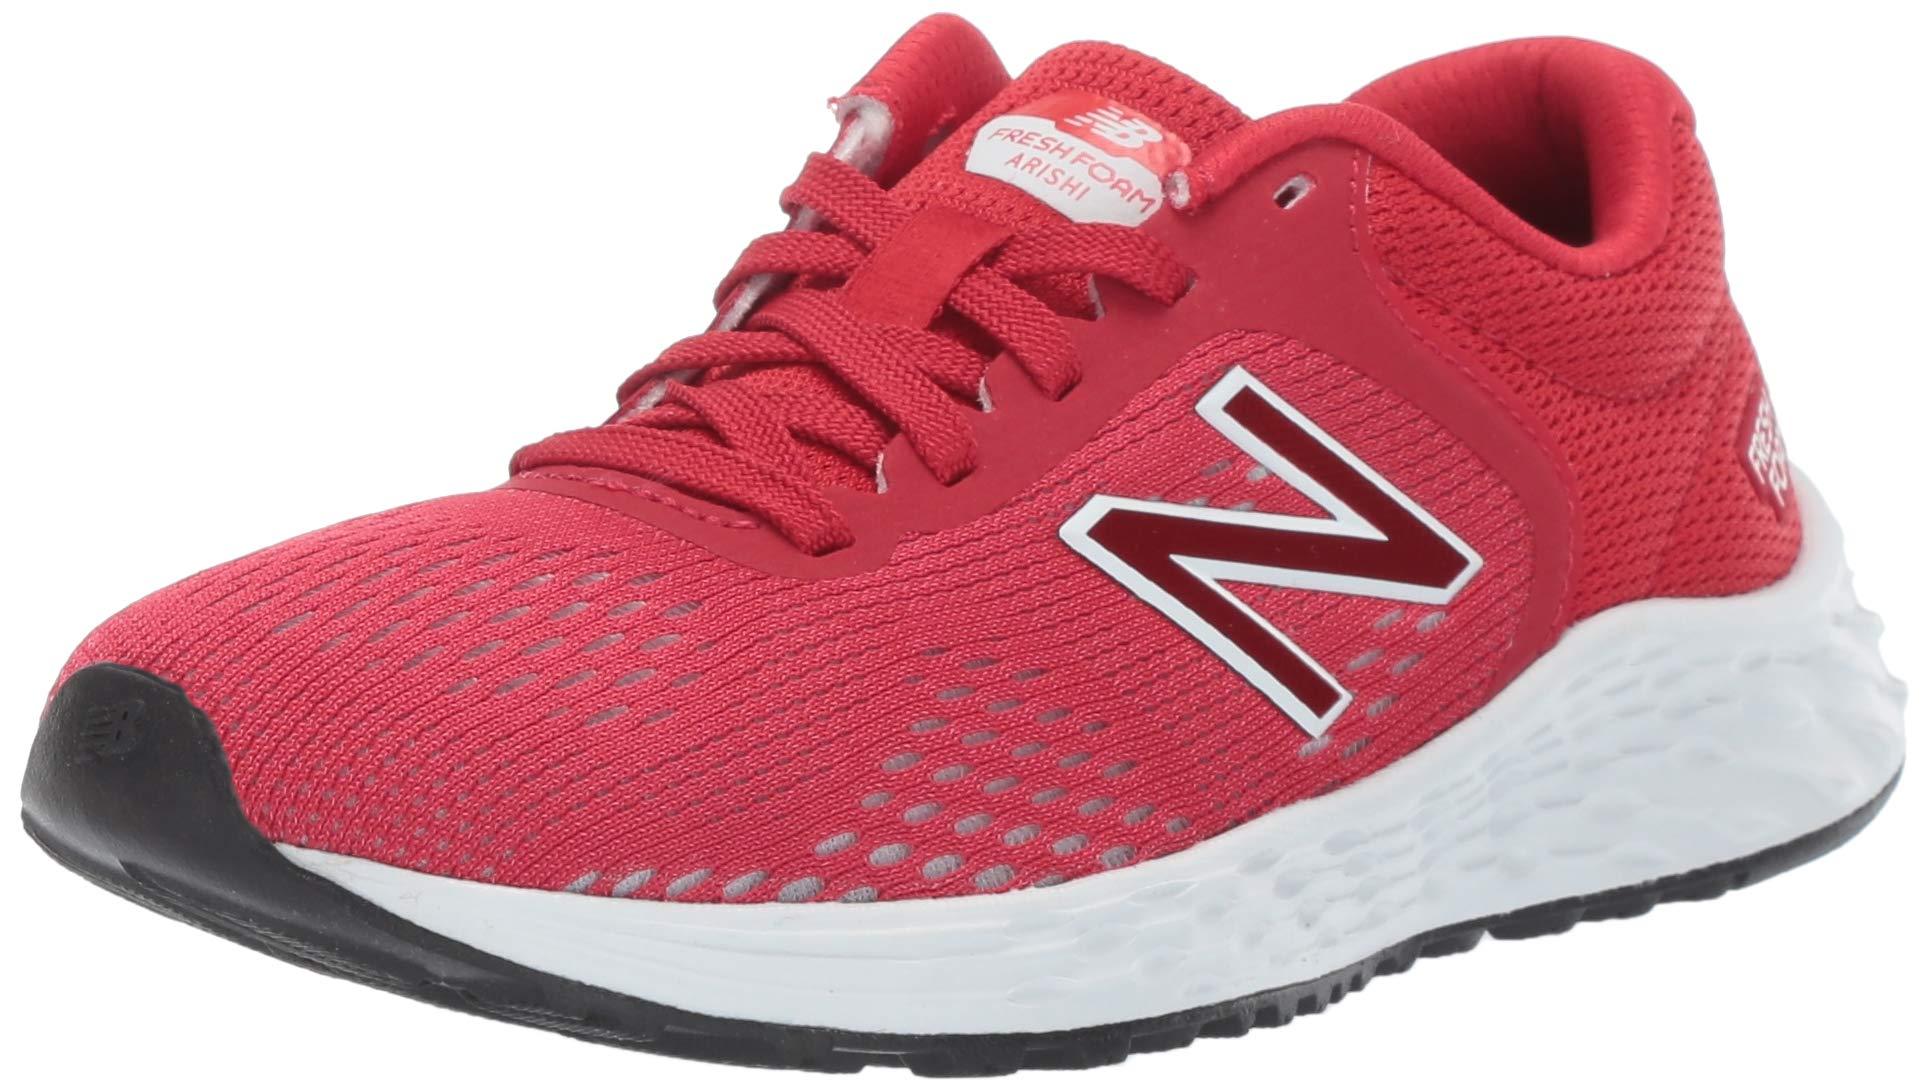 New Balance Boys' Arishi V2 Running Shoe, Team Red/White, 4.5 W US Big Kid